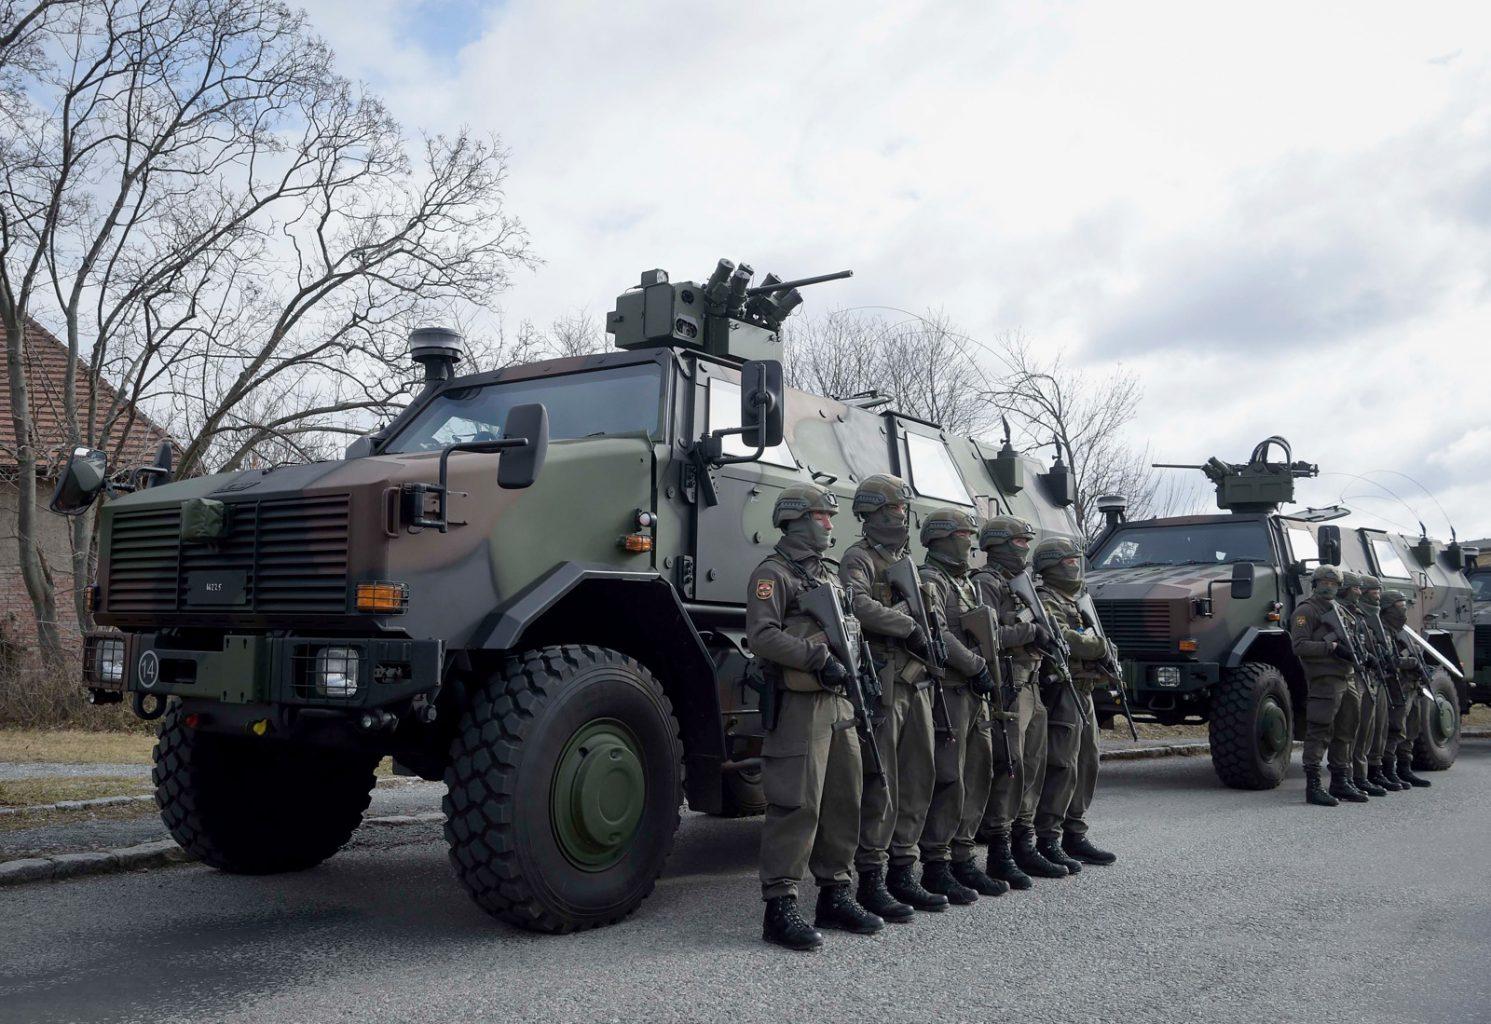 Allschutzfahrzeug DINGO 2A3 PatSi (Patrouillen-/Sicherungsfahrzeug) © Bundesheer